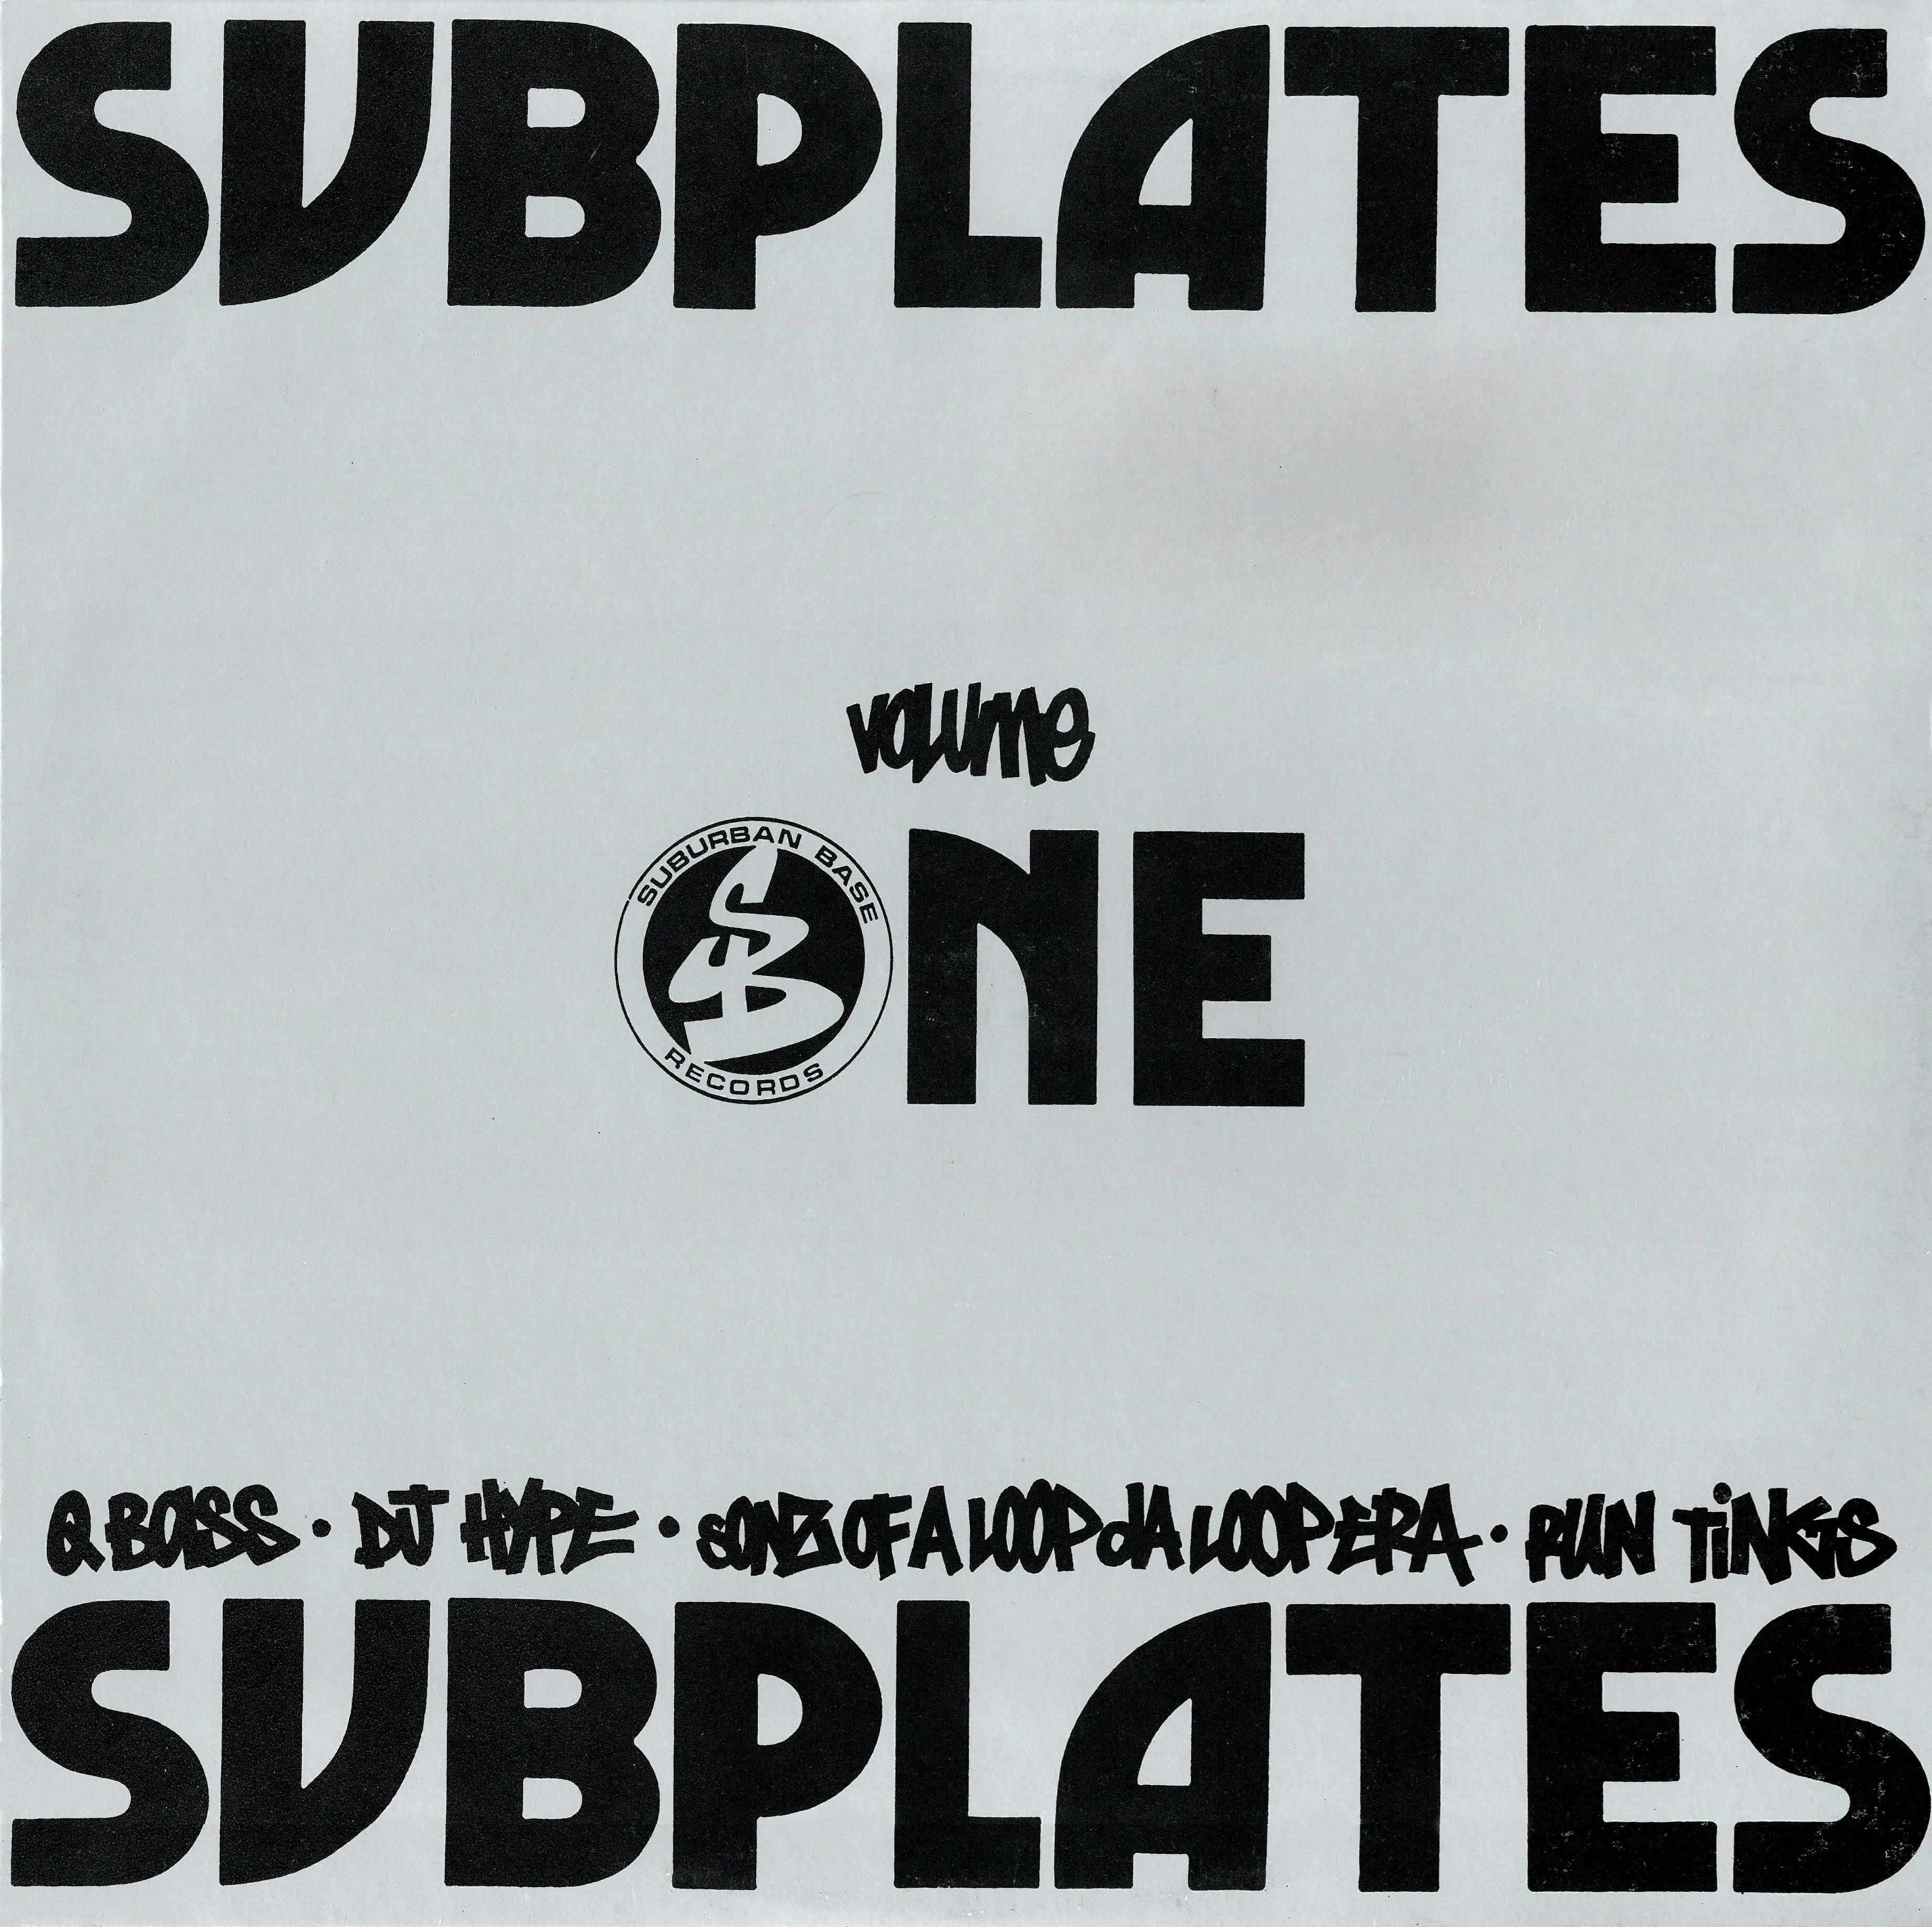 subbase24